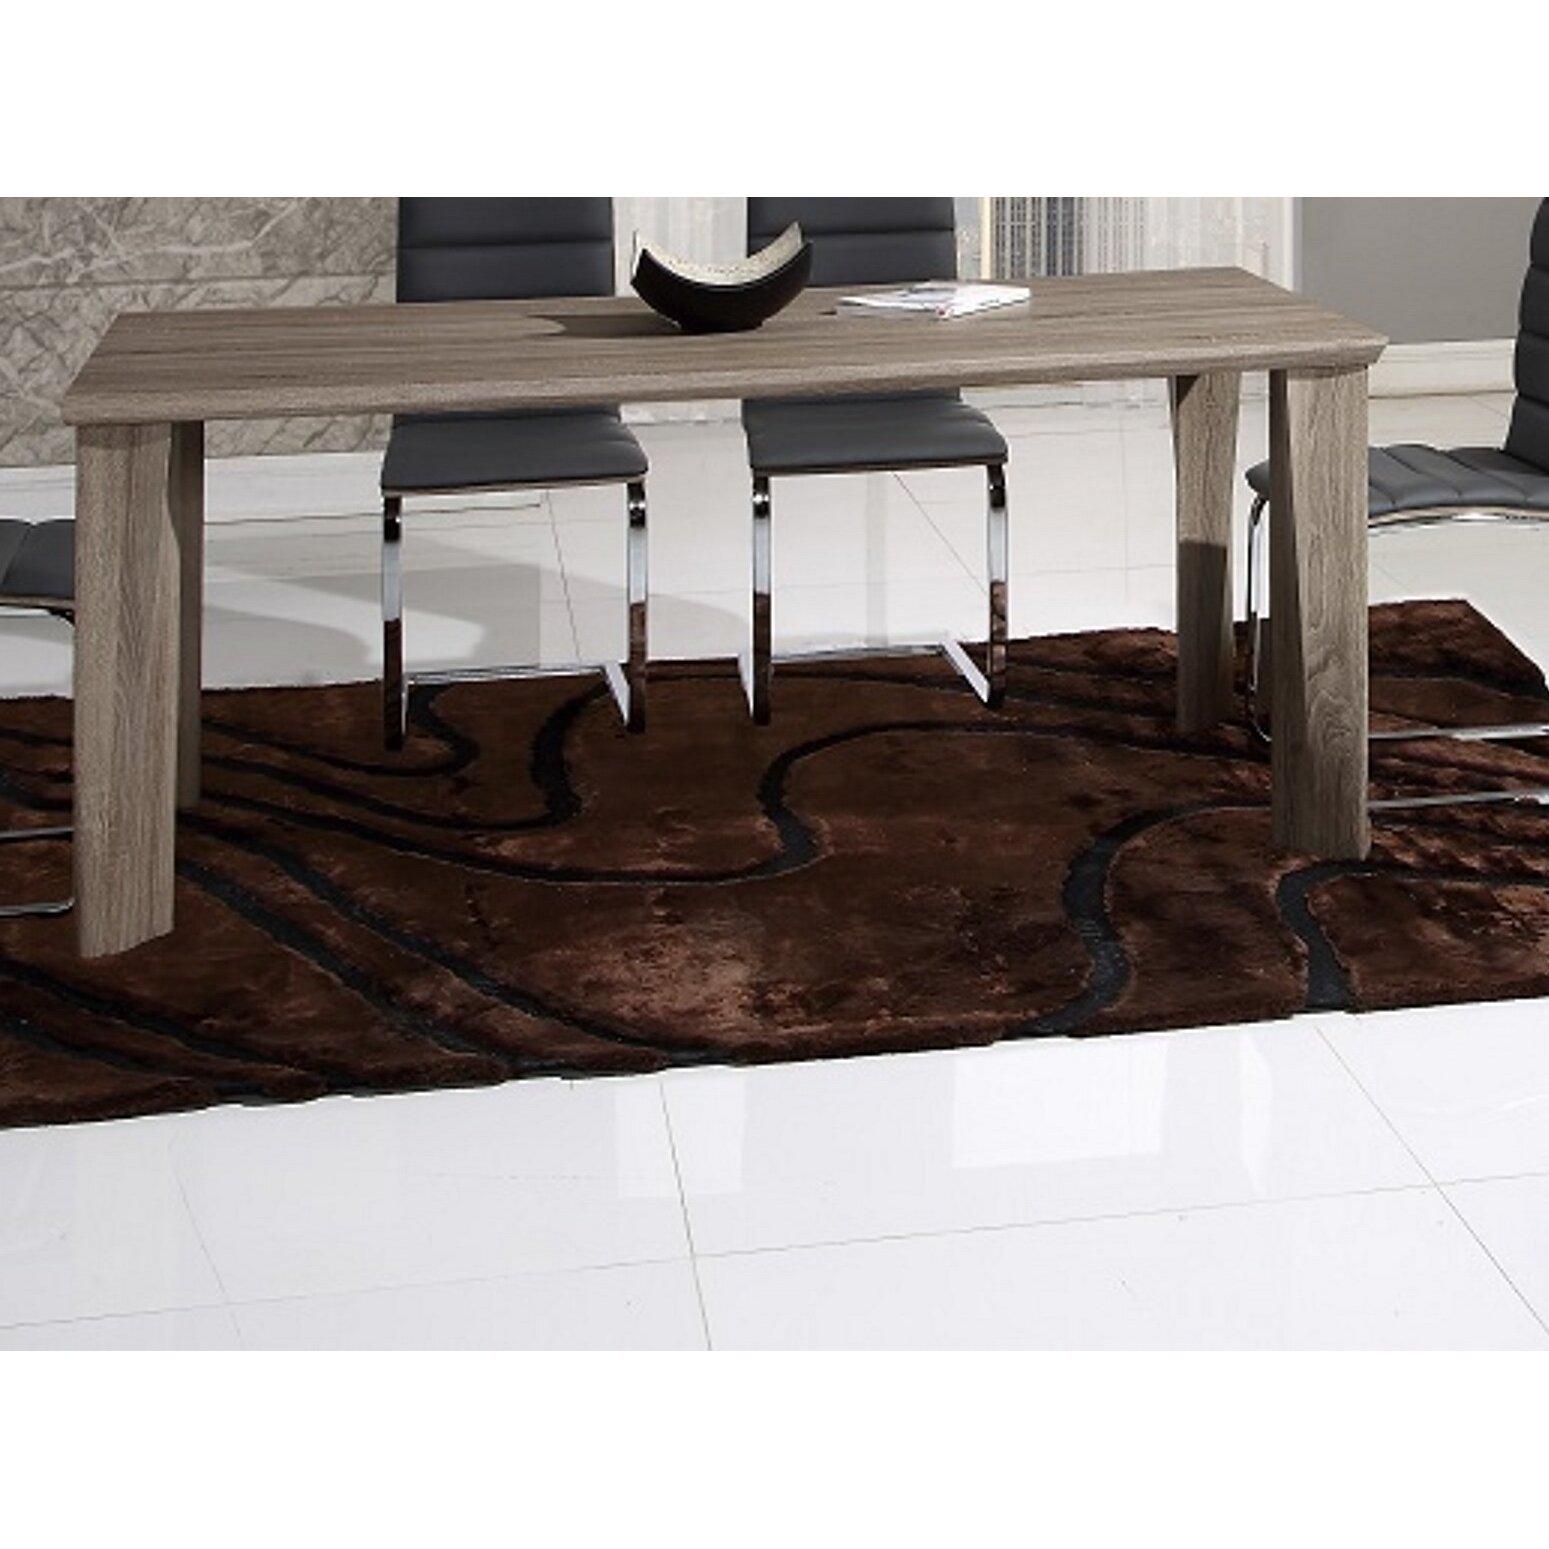 Global Furniture USA Extendable Dining Table Wayfair - Dining room furniture usa